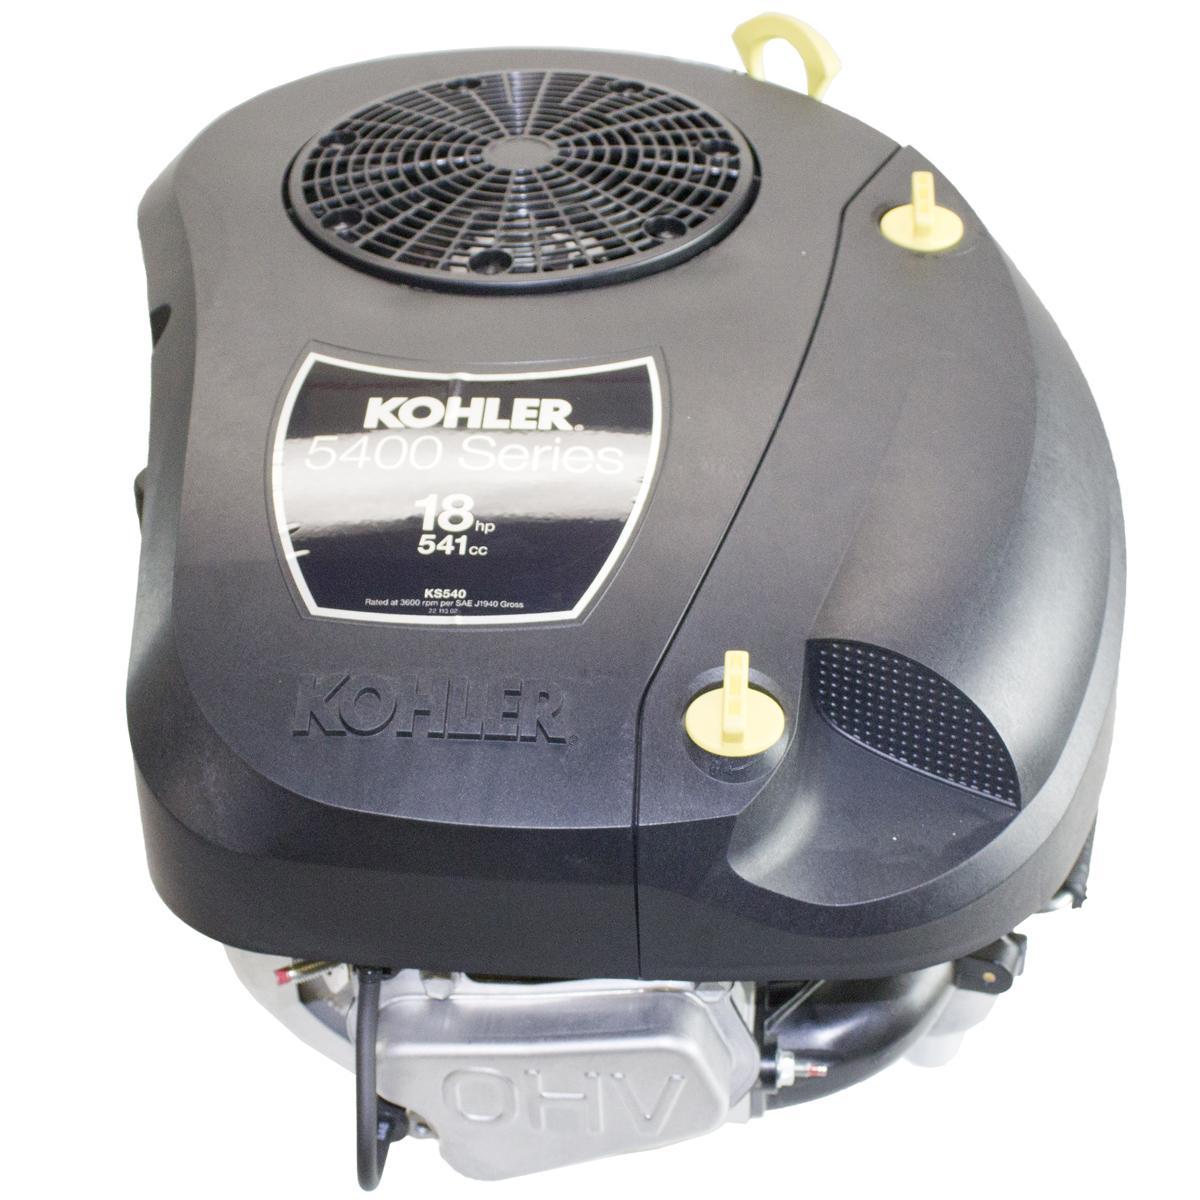 "18hp Kohler 5400 Series Vertical 1"" x 3-5/32"" Shaft, Oil Filter, Electric Start, 12 Amp Alternator, Fuel Pump Cast Iron Sleeve"